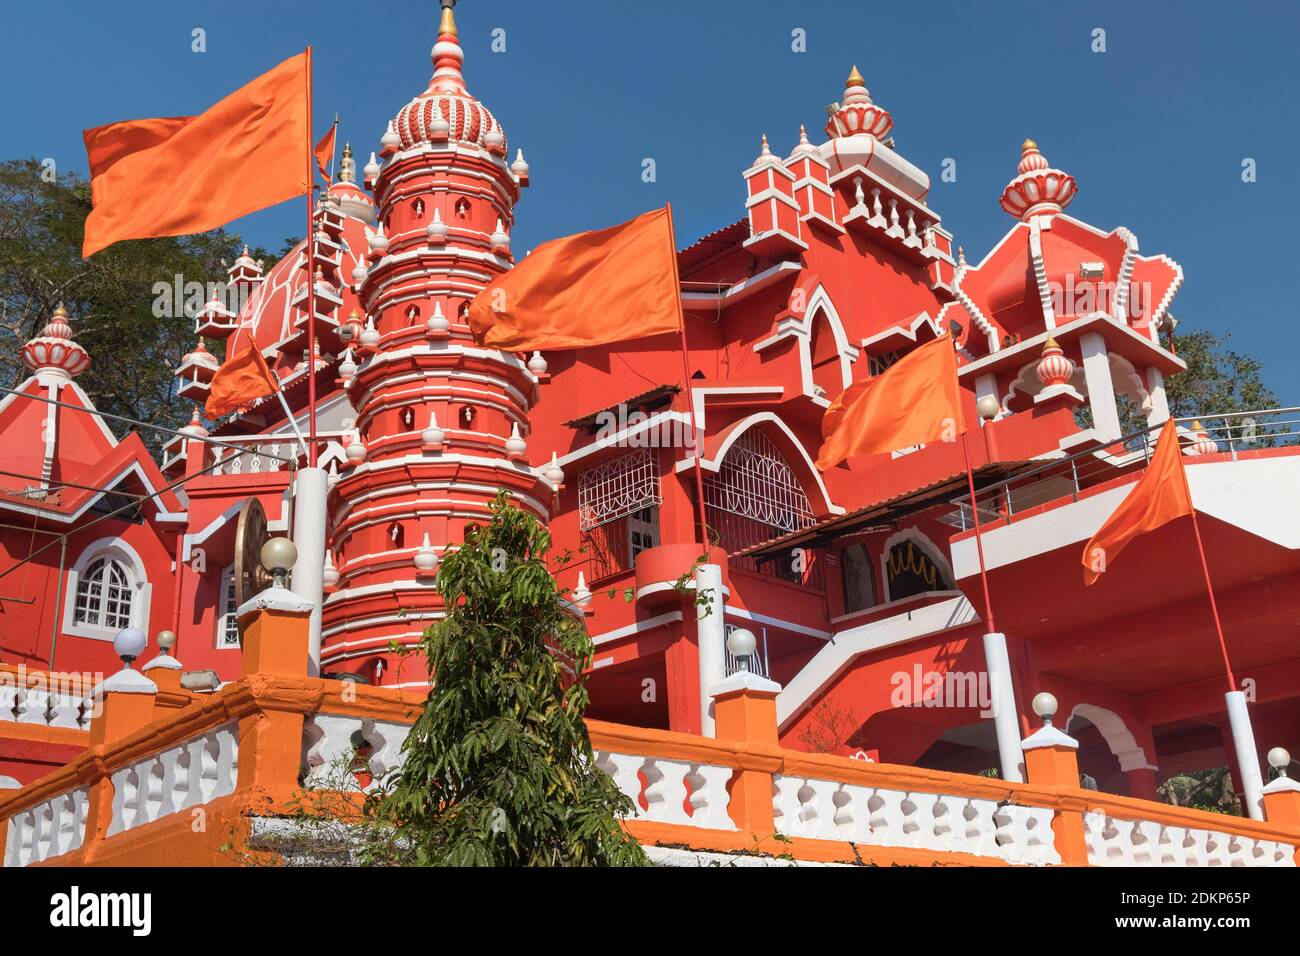 Maruti Temple Hindou Altinho Panjim Goa Inde Banque D'Images